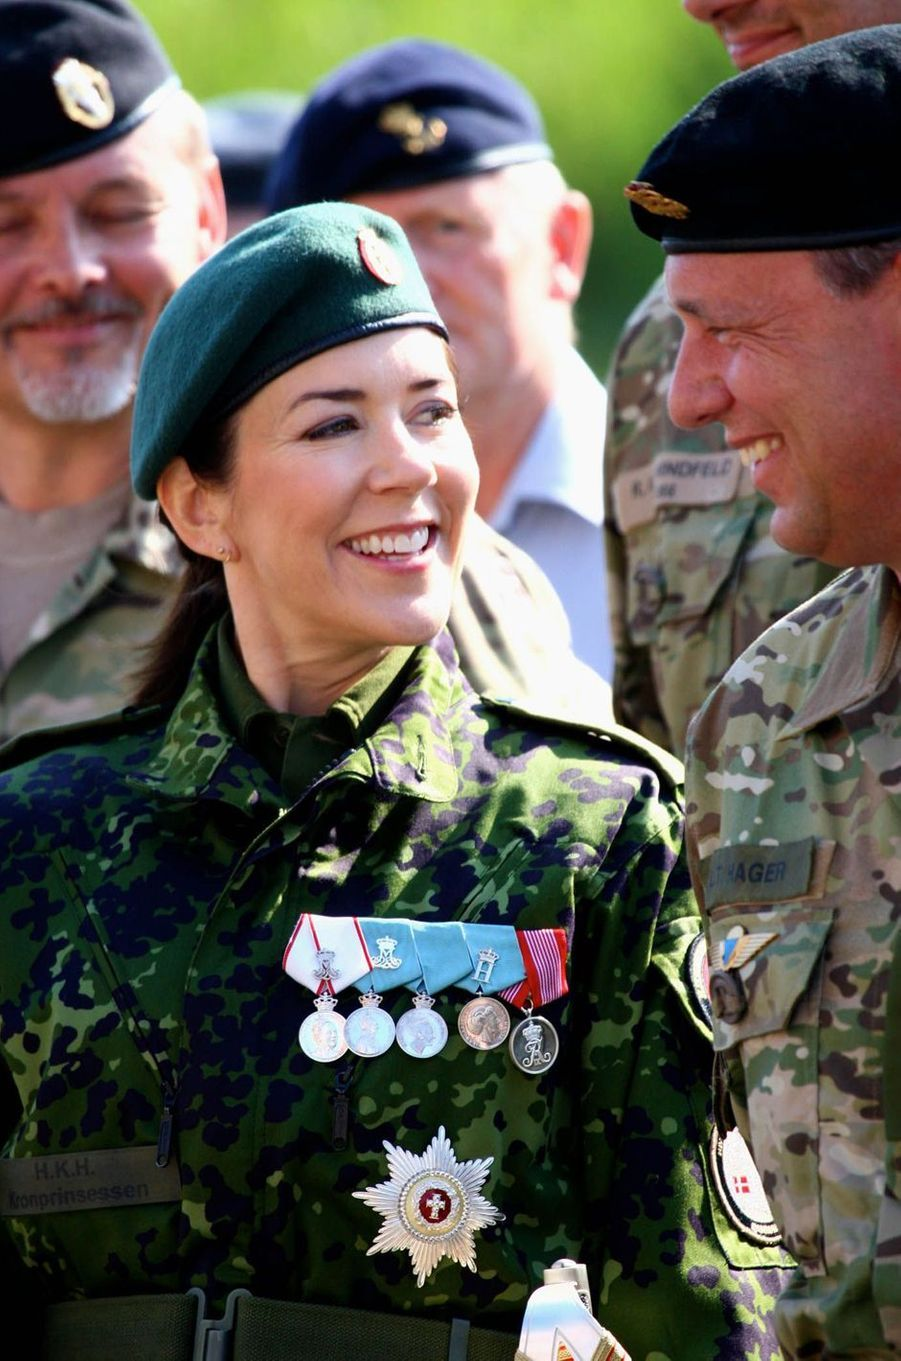 La princesse Mary de Danemark à Fredericia, le 5 juin 2016